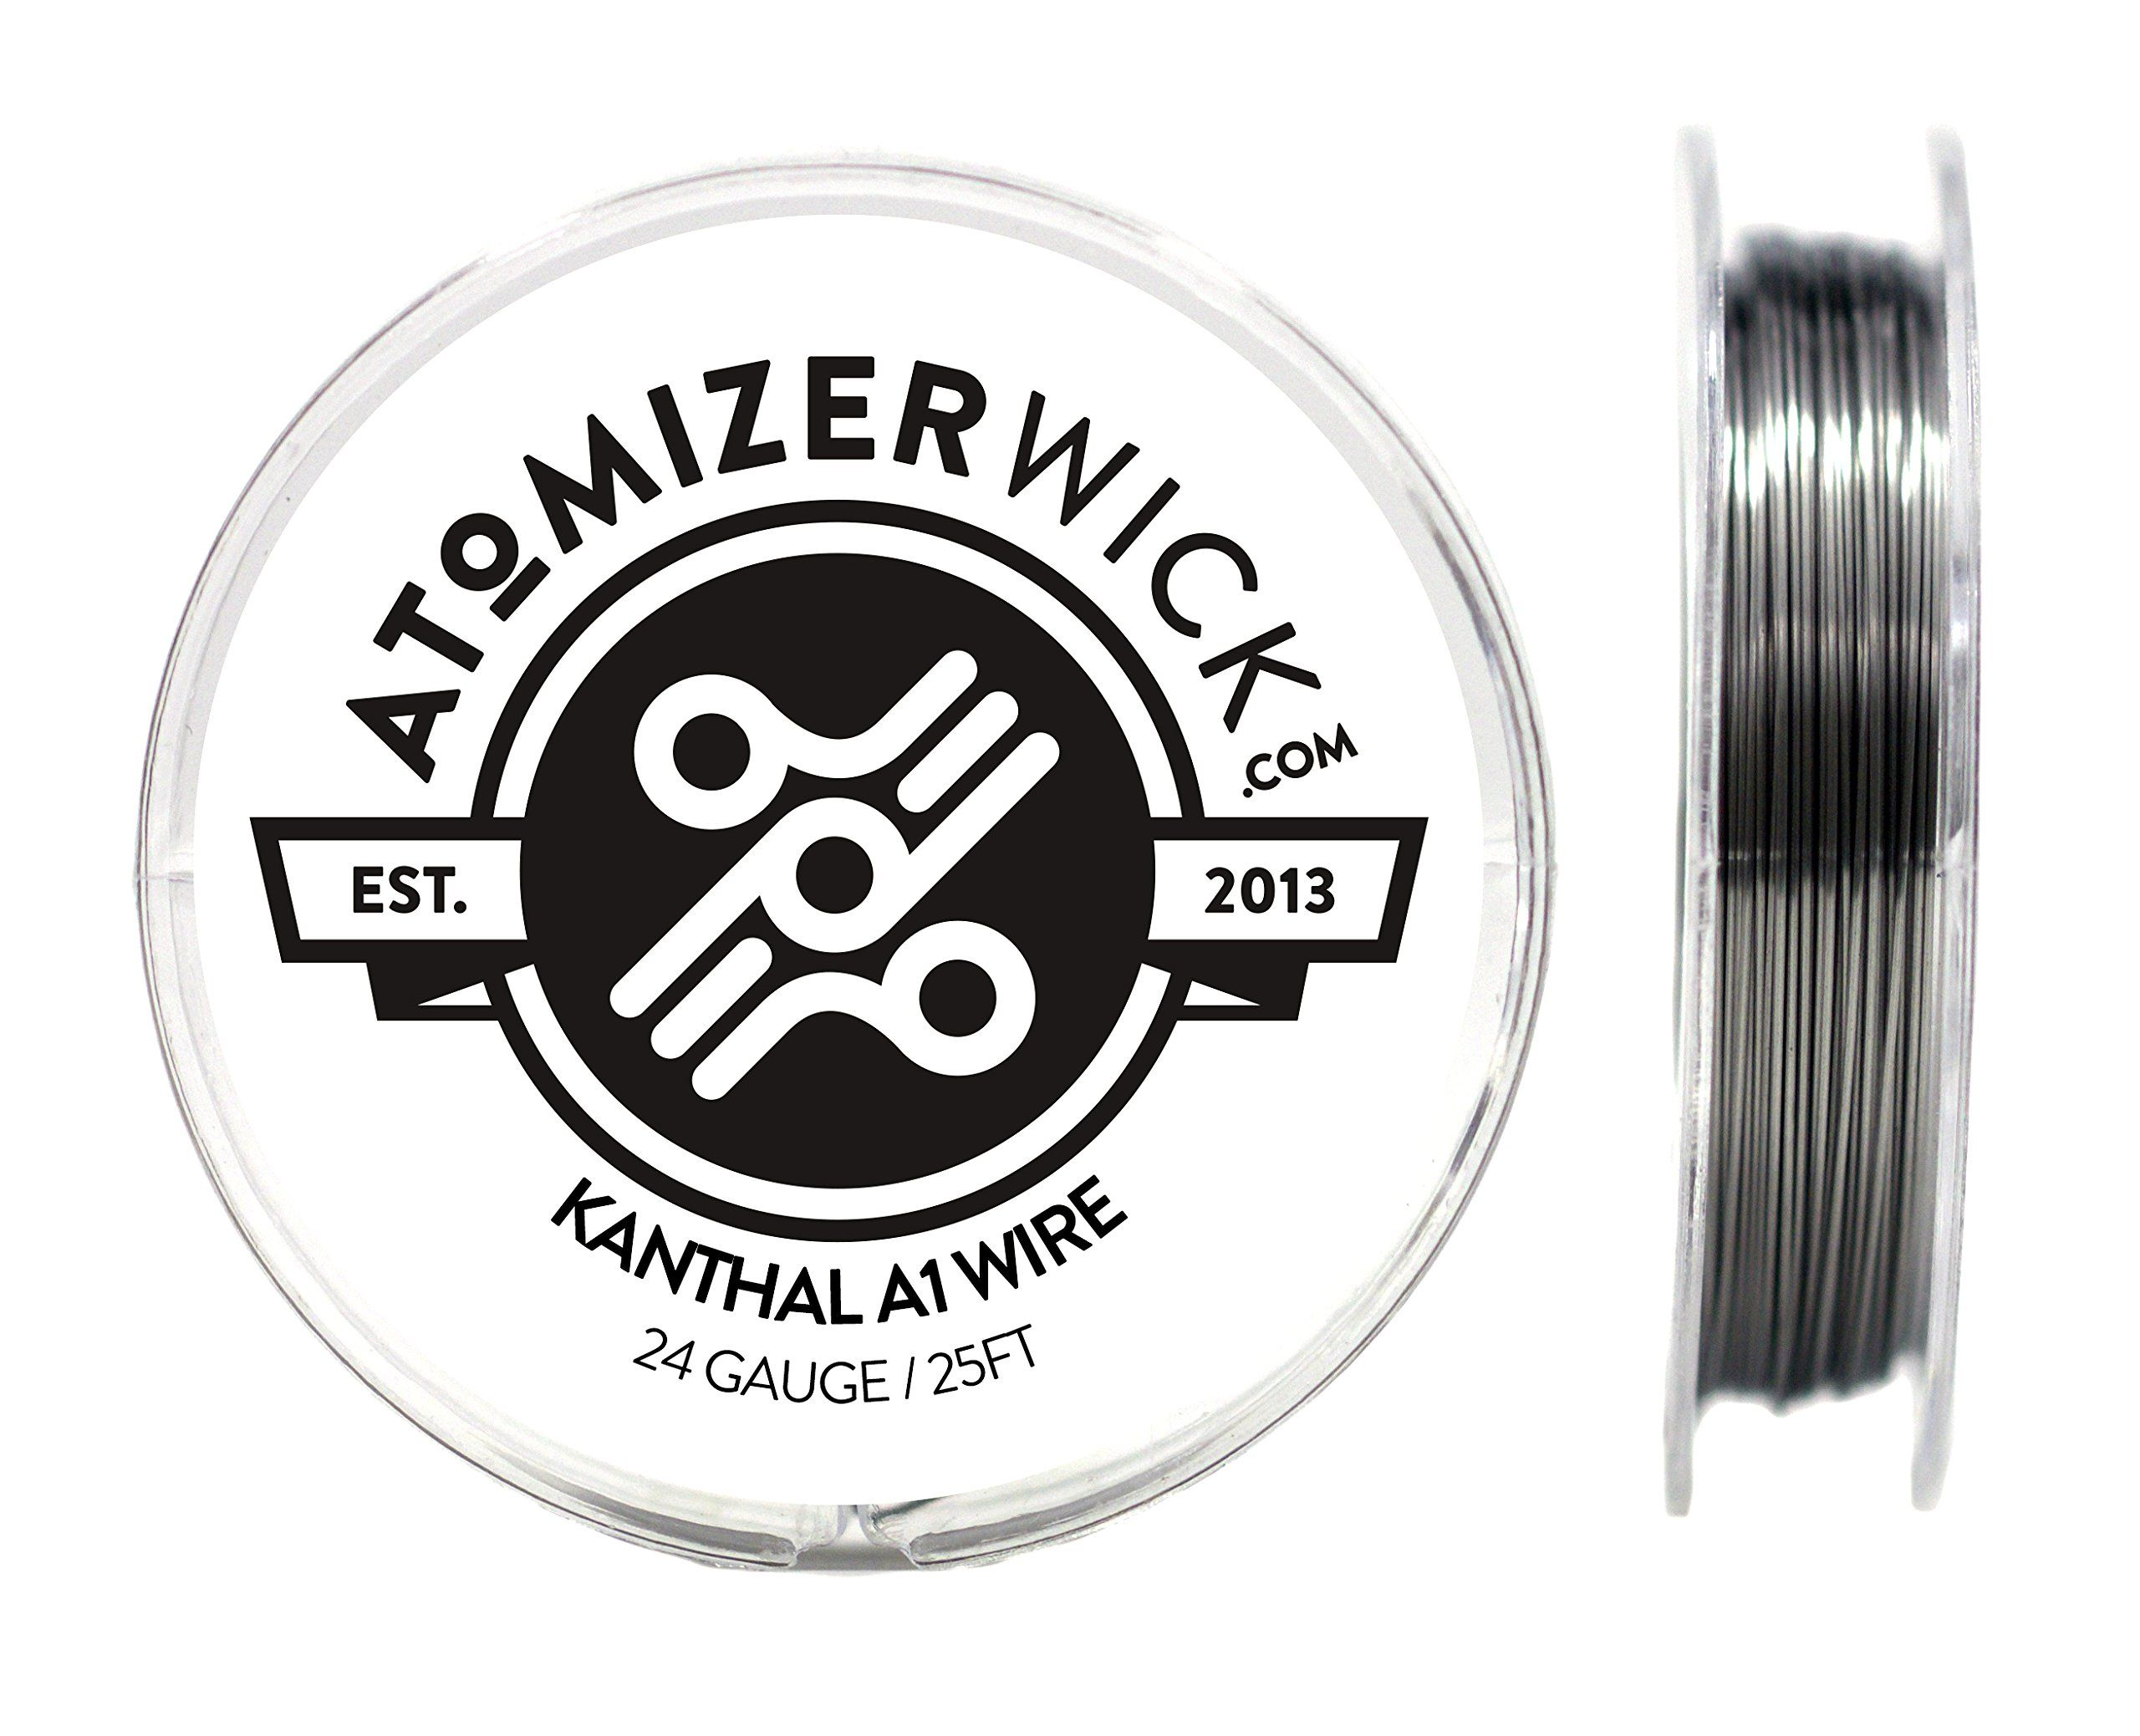 Genuine Atomizerwick Brand 24 Gauge Kanthal A1 Wire